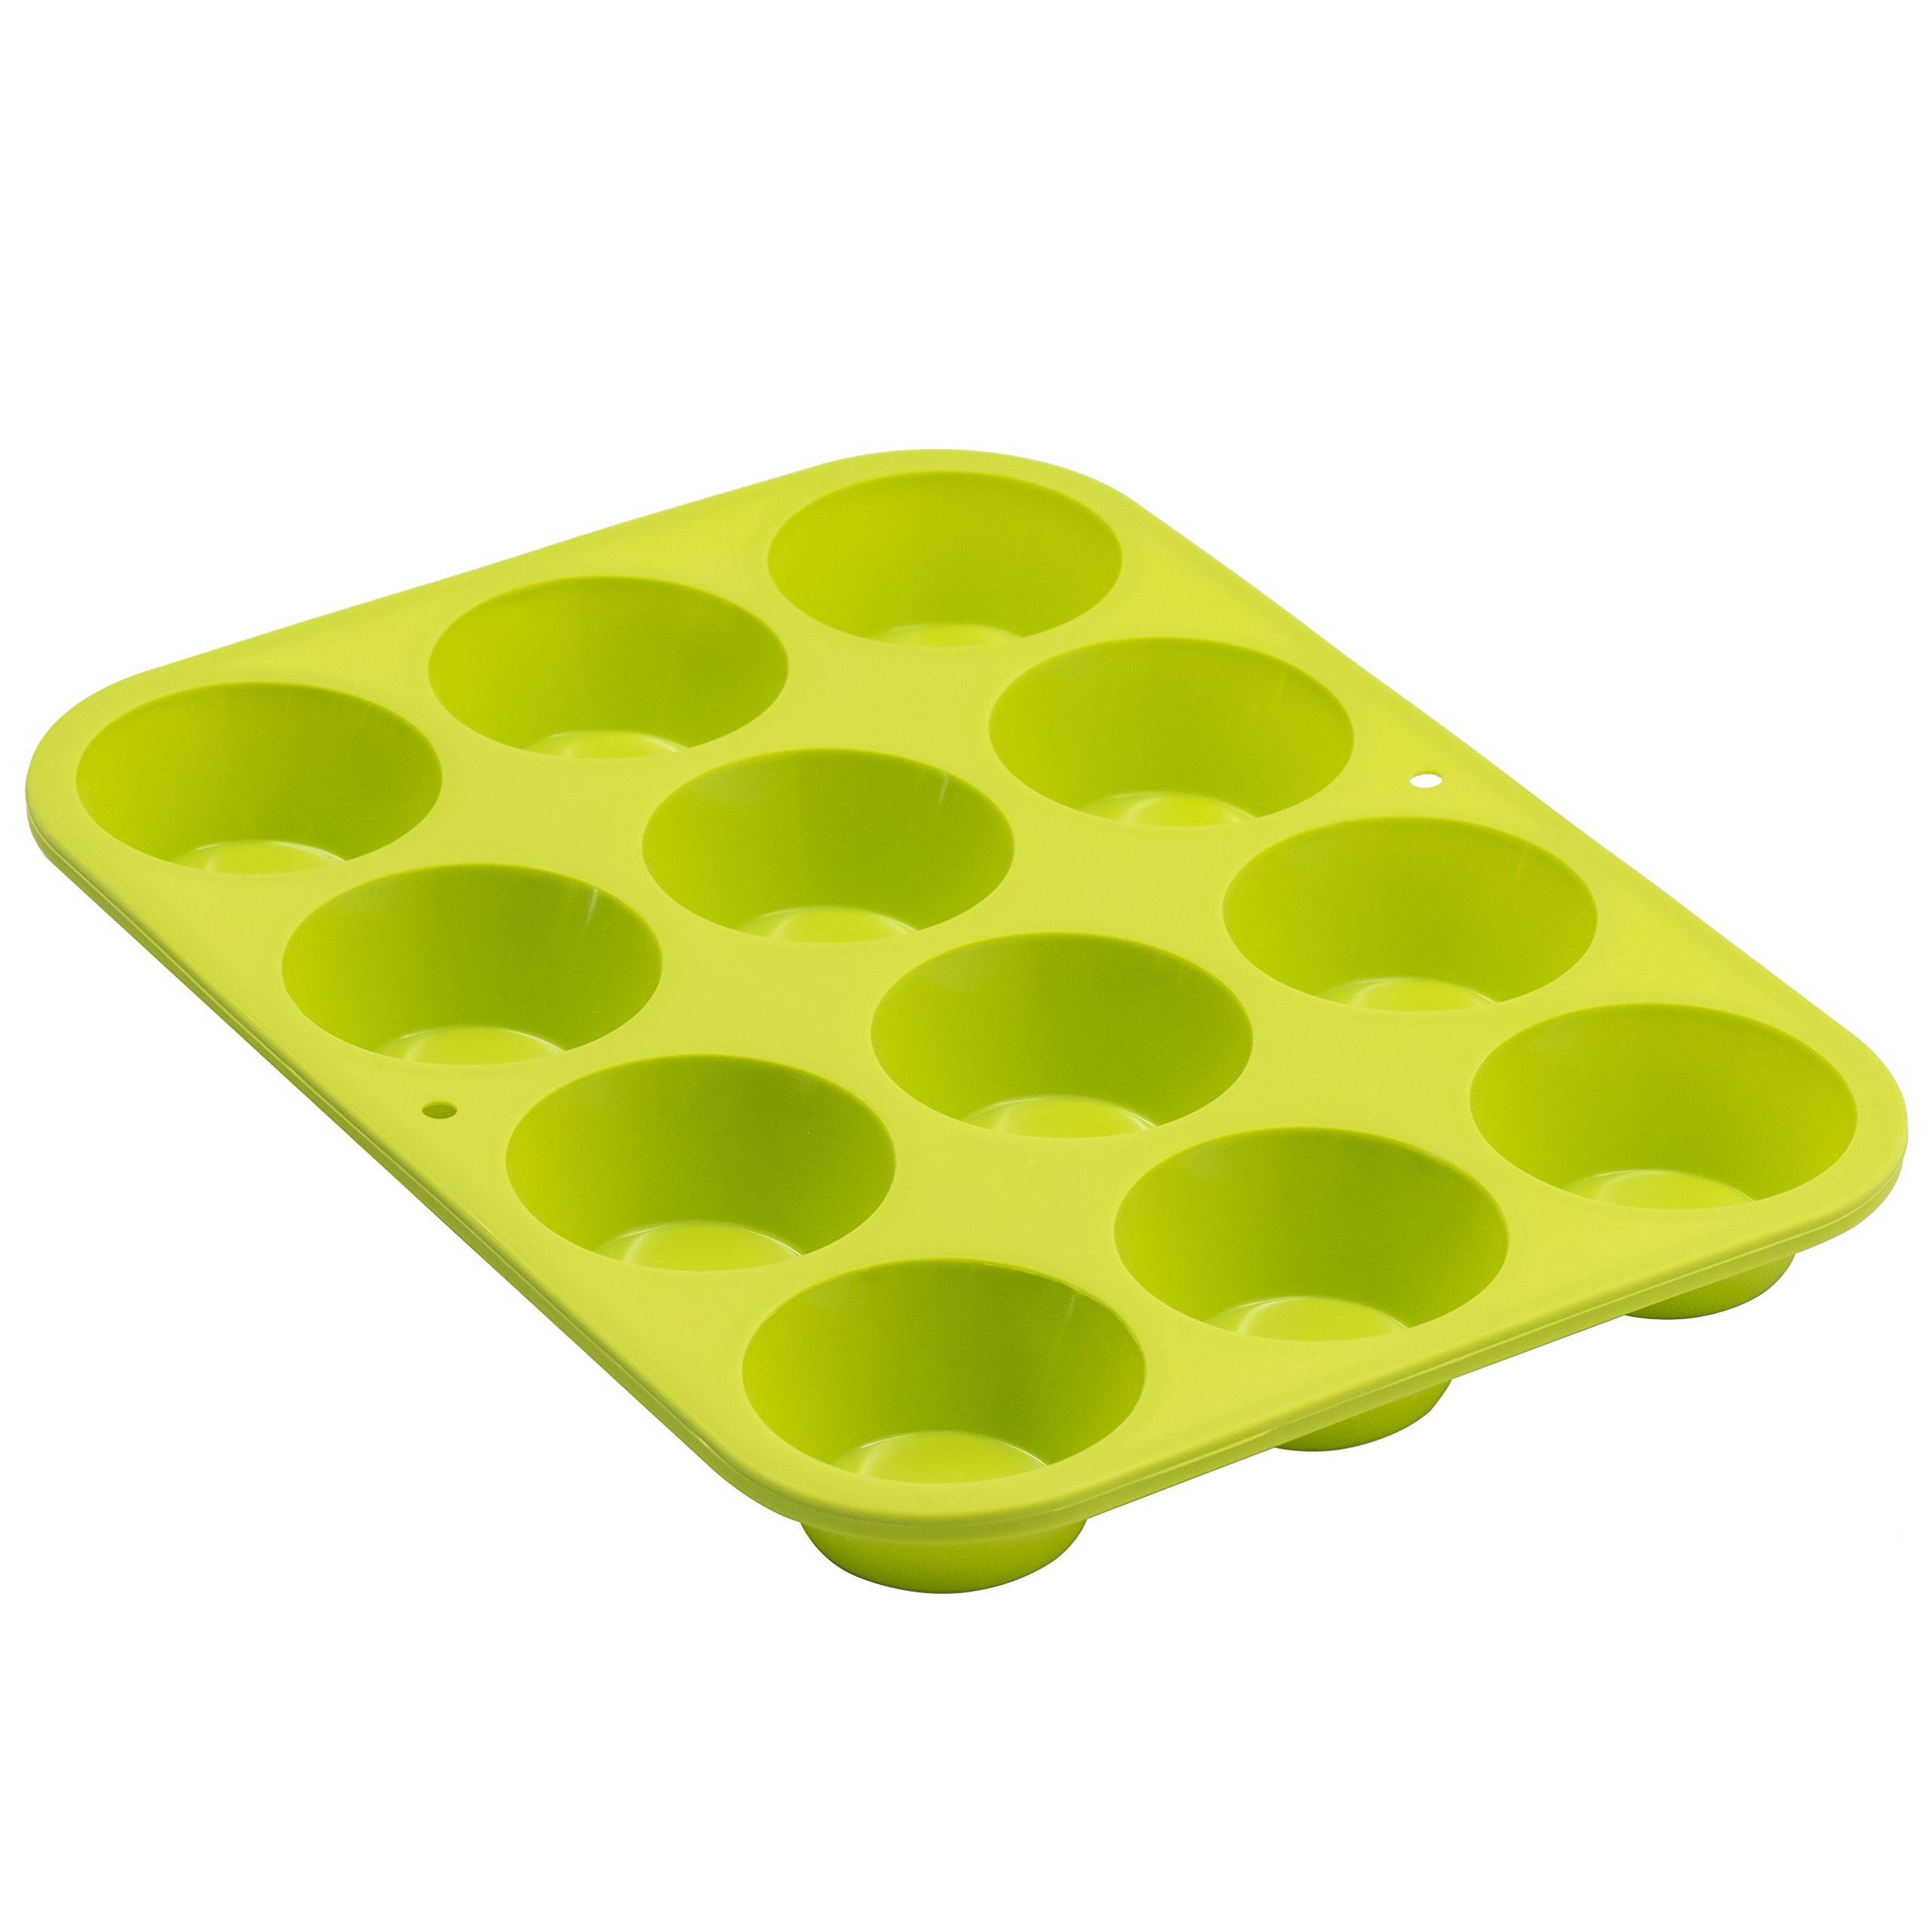 Marathon Housewares KW200011GR Premium Silicone 12 Cup Mini Muffin Pan, Green by Marathon Housewares (Image #1)